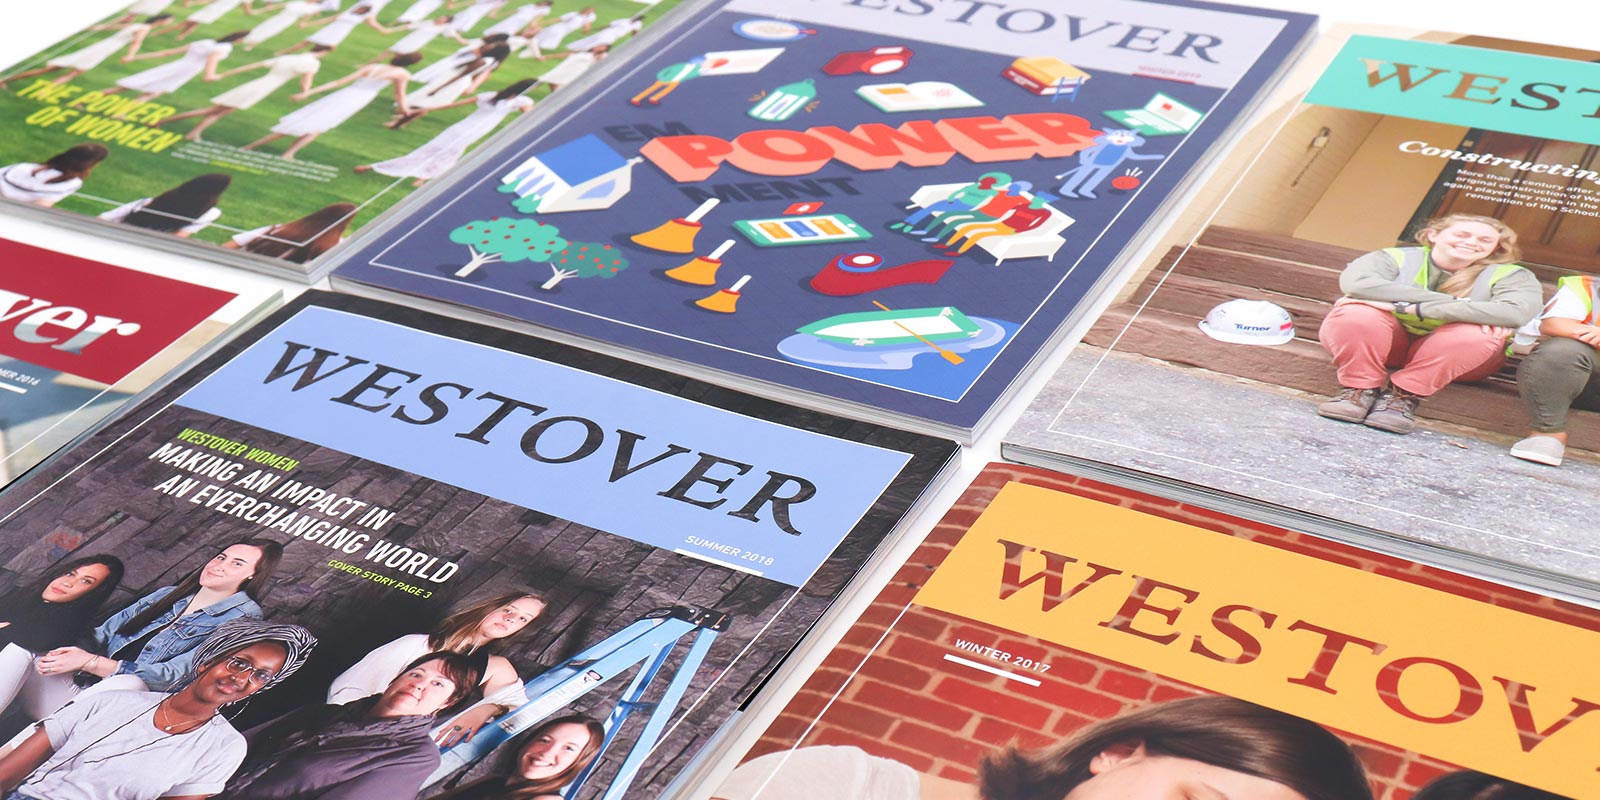 Westover School magazine design